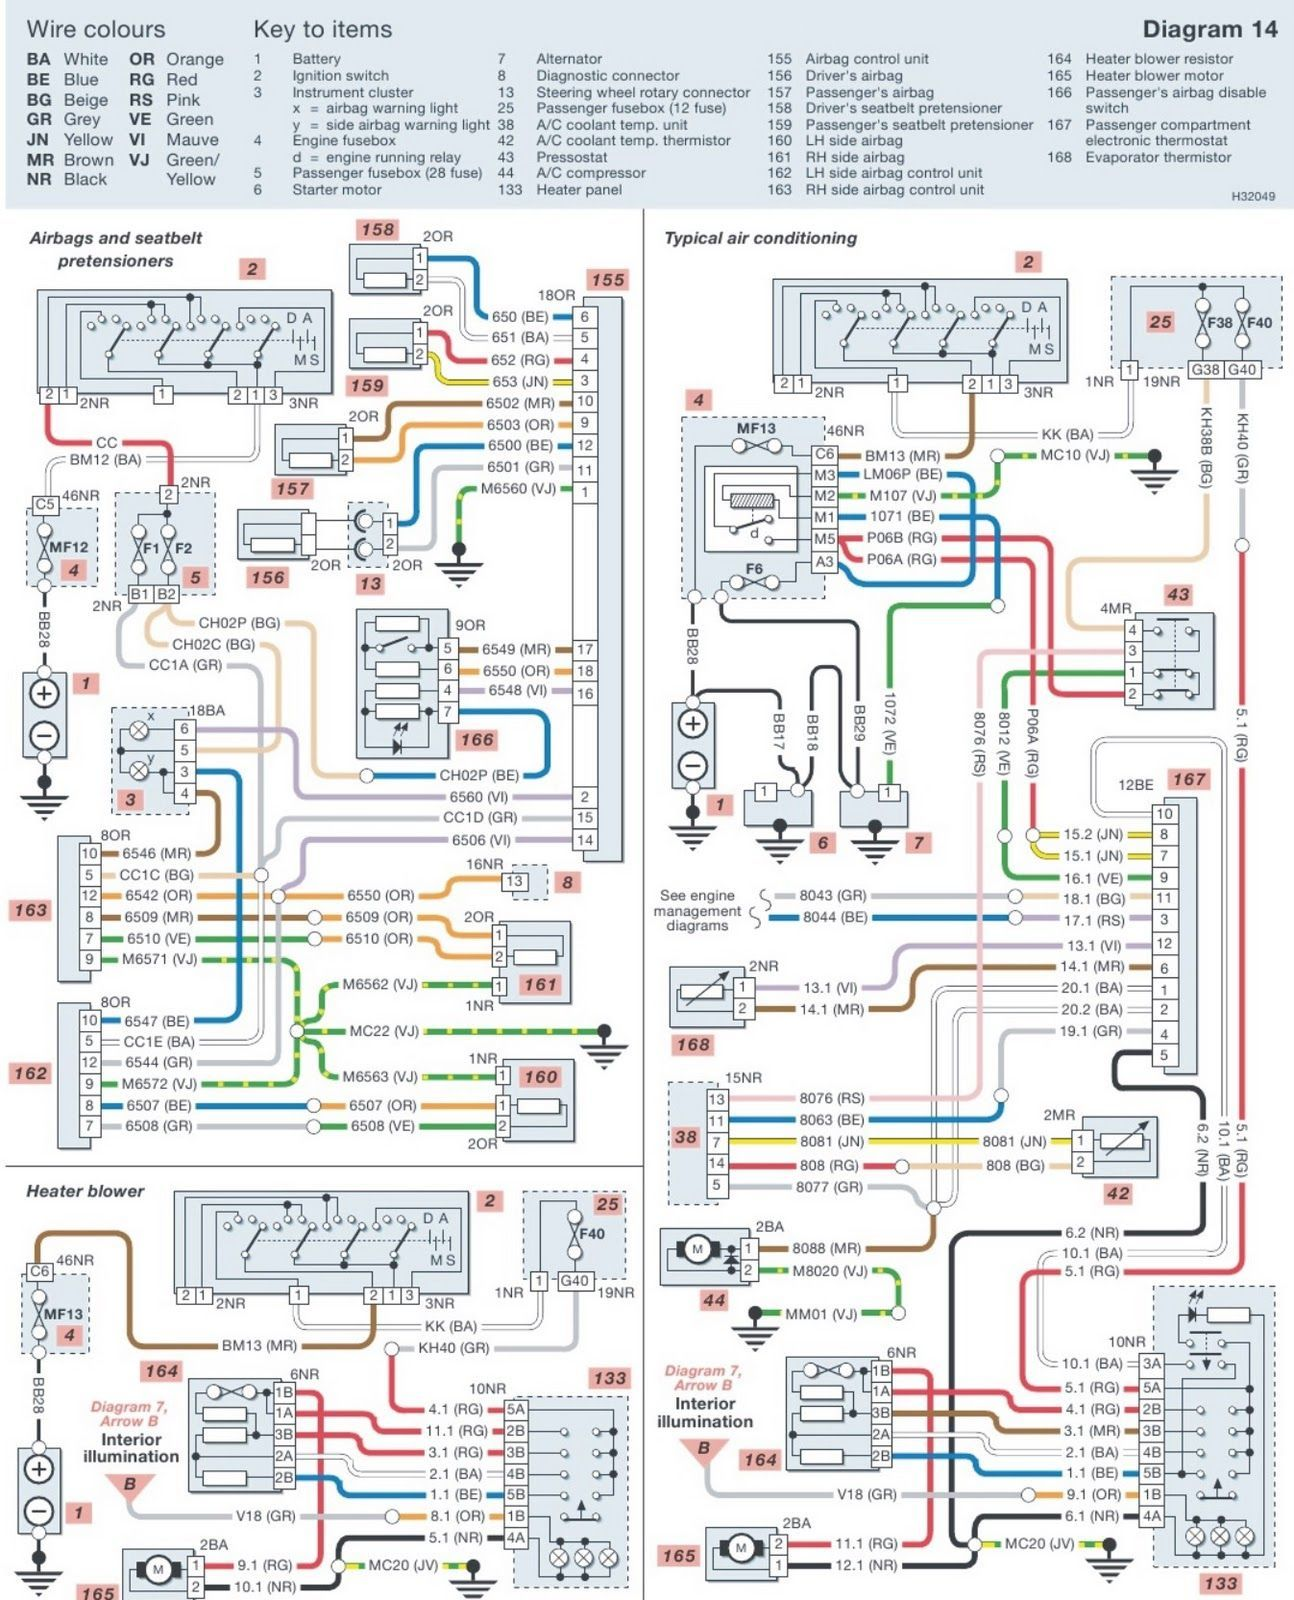 [SCHEMATICS_4UK]  TF_2086] Electric Radiator Fan Wiring Diagram Also Peugeot 207 Cc  Additionally Free Diagram | Wiring Diagram Peugeot 307 Cc |  | Spoat Drosi Jebrp Mohammedshrine Librar Wiring 101